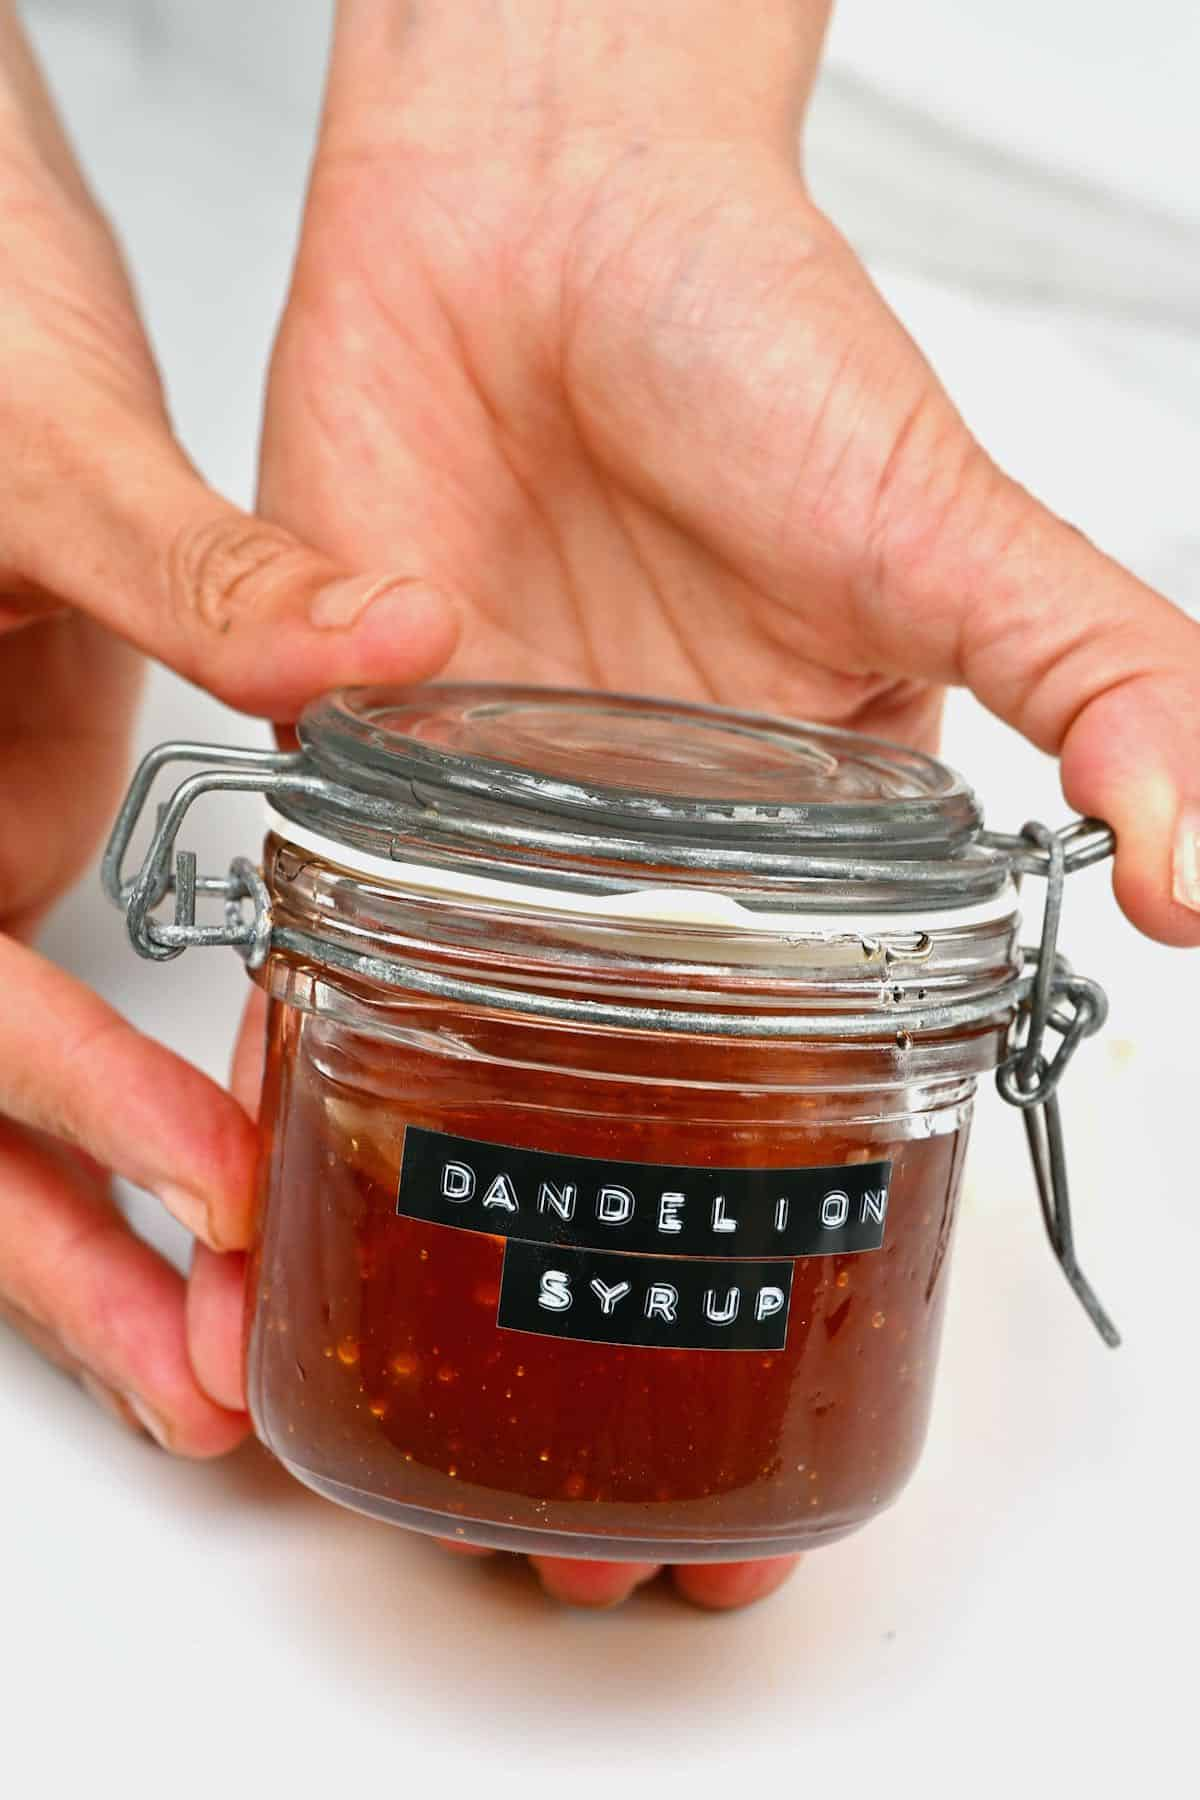 A jar with dandelion syrup